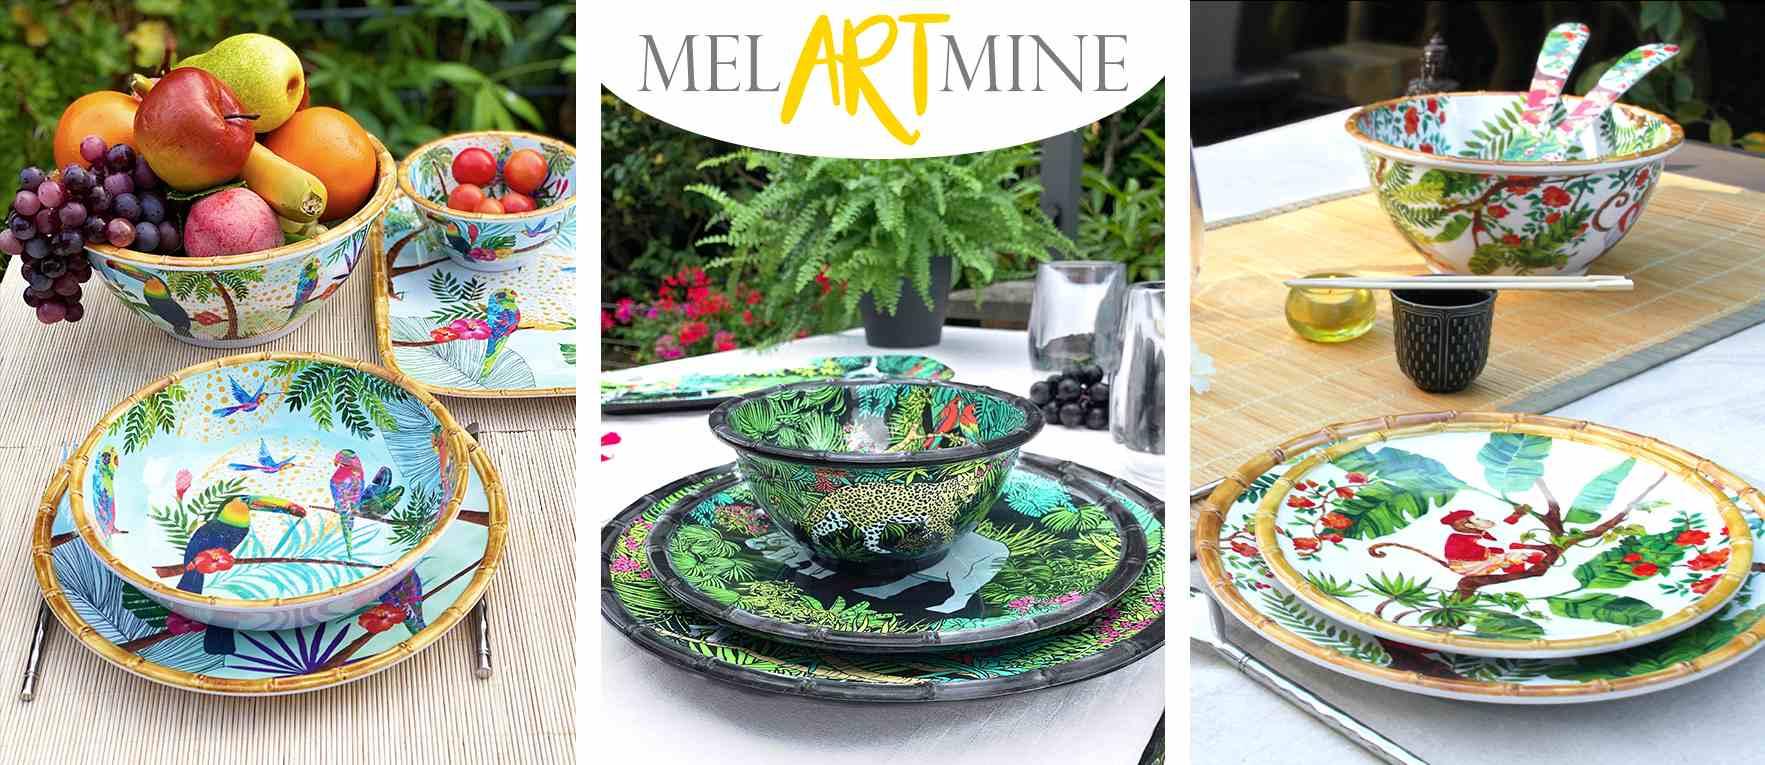 Vajilla de melamina : arte de la mesa colorida